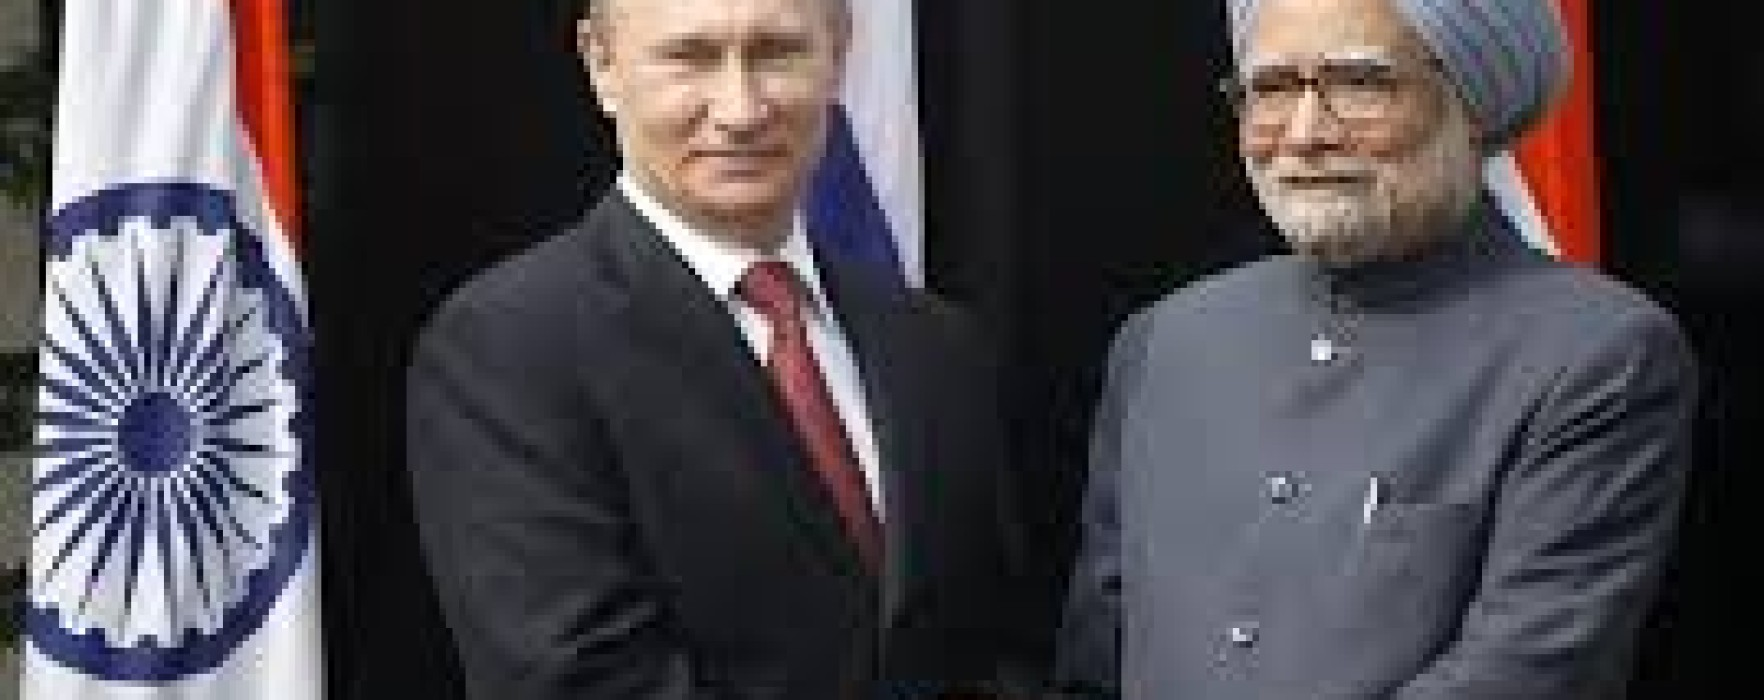 India in Western le EU hlum in Russia hnen tel hang